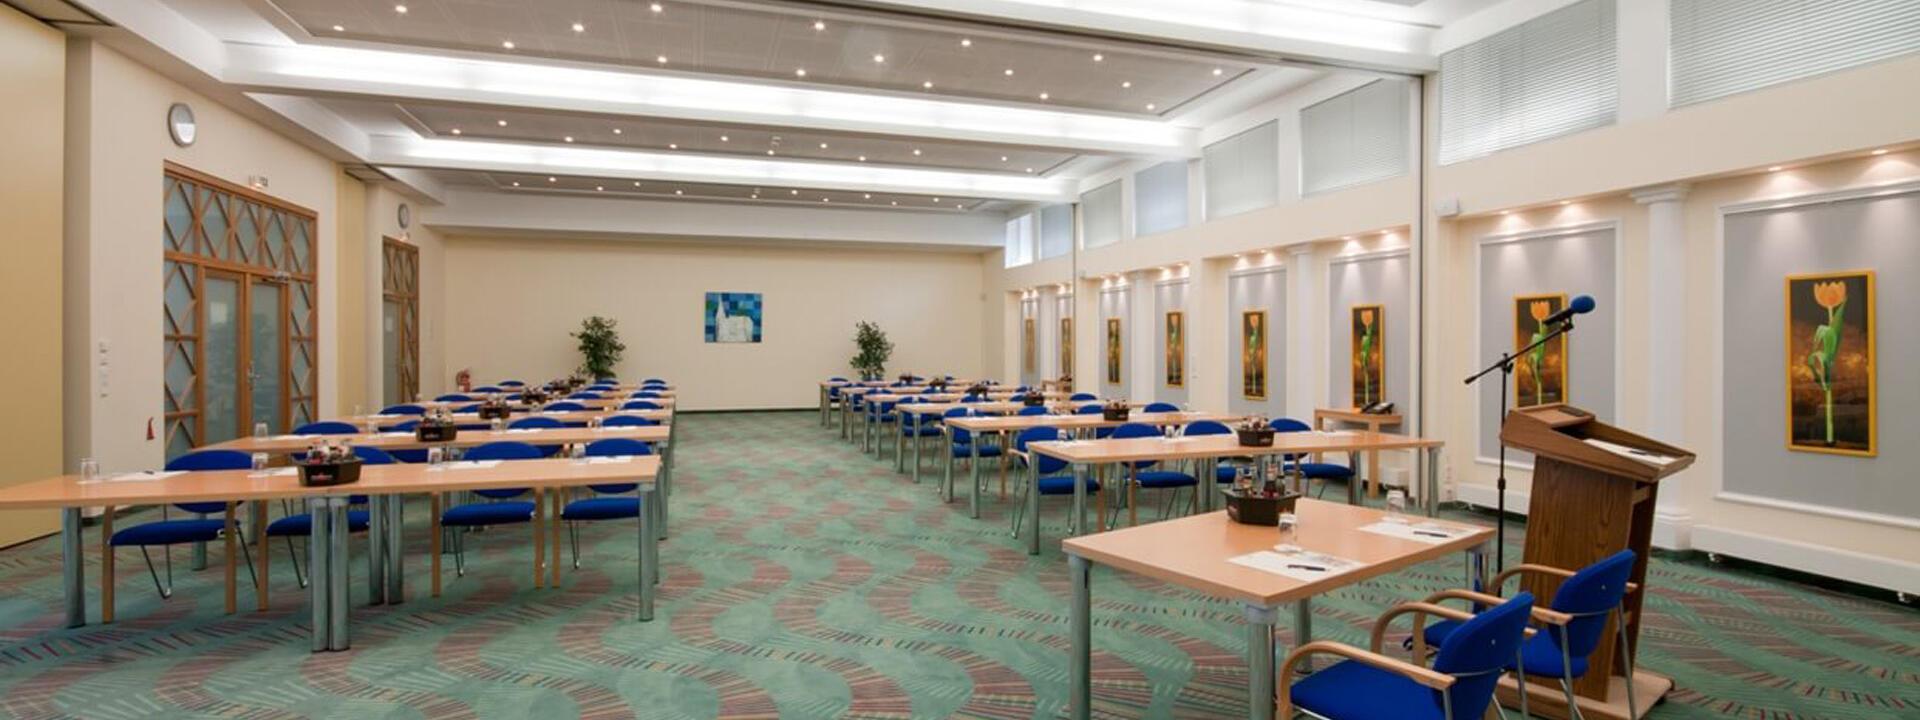 meeting room at Precise Resort Marina Wolfsbruch